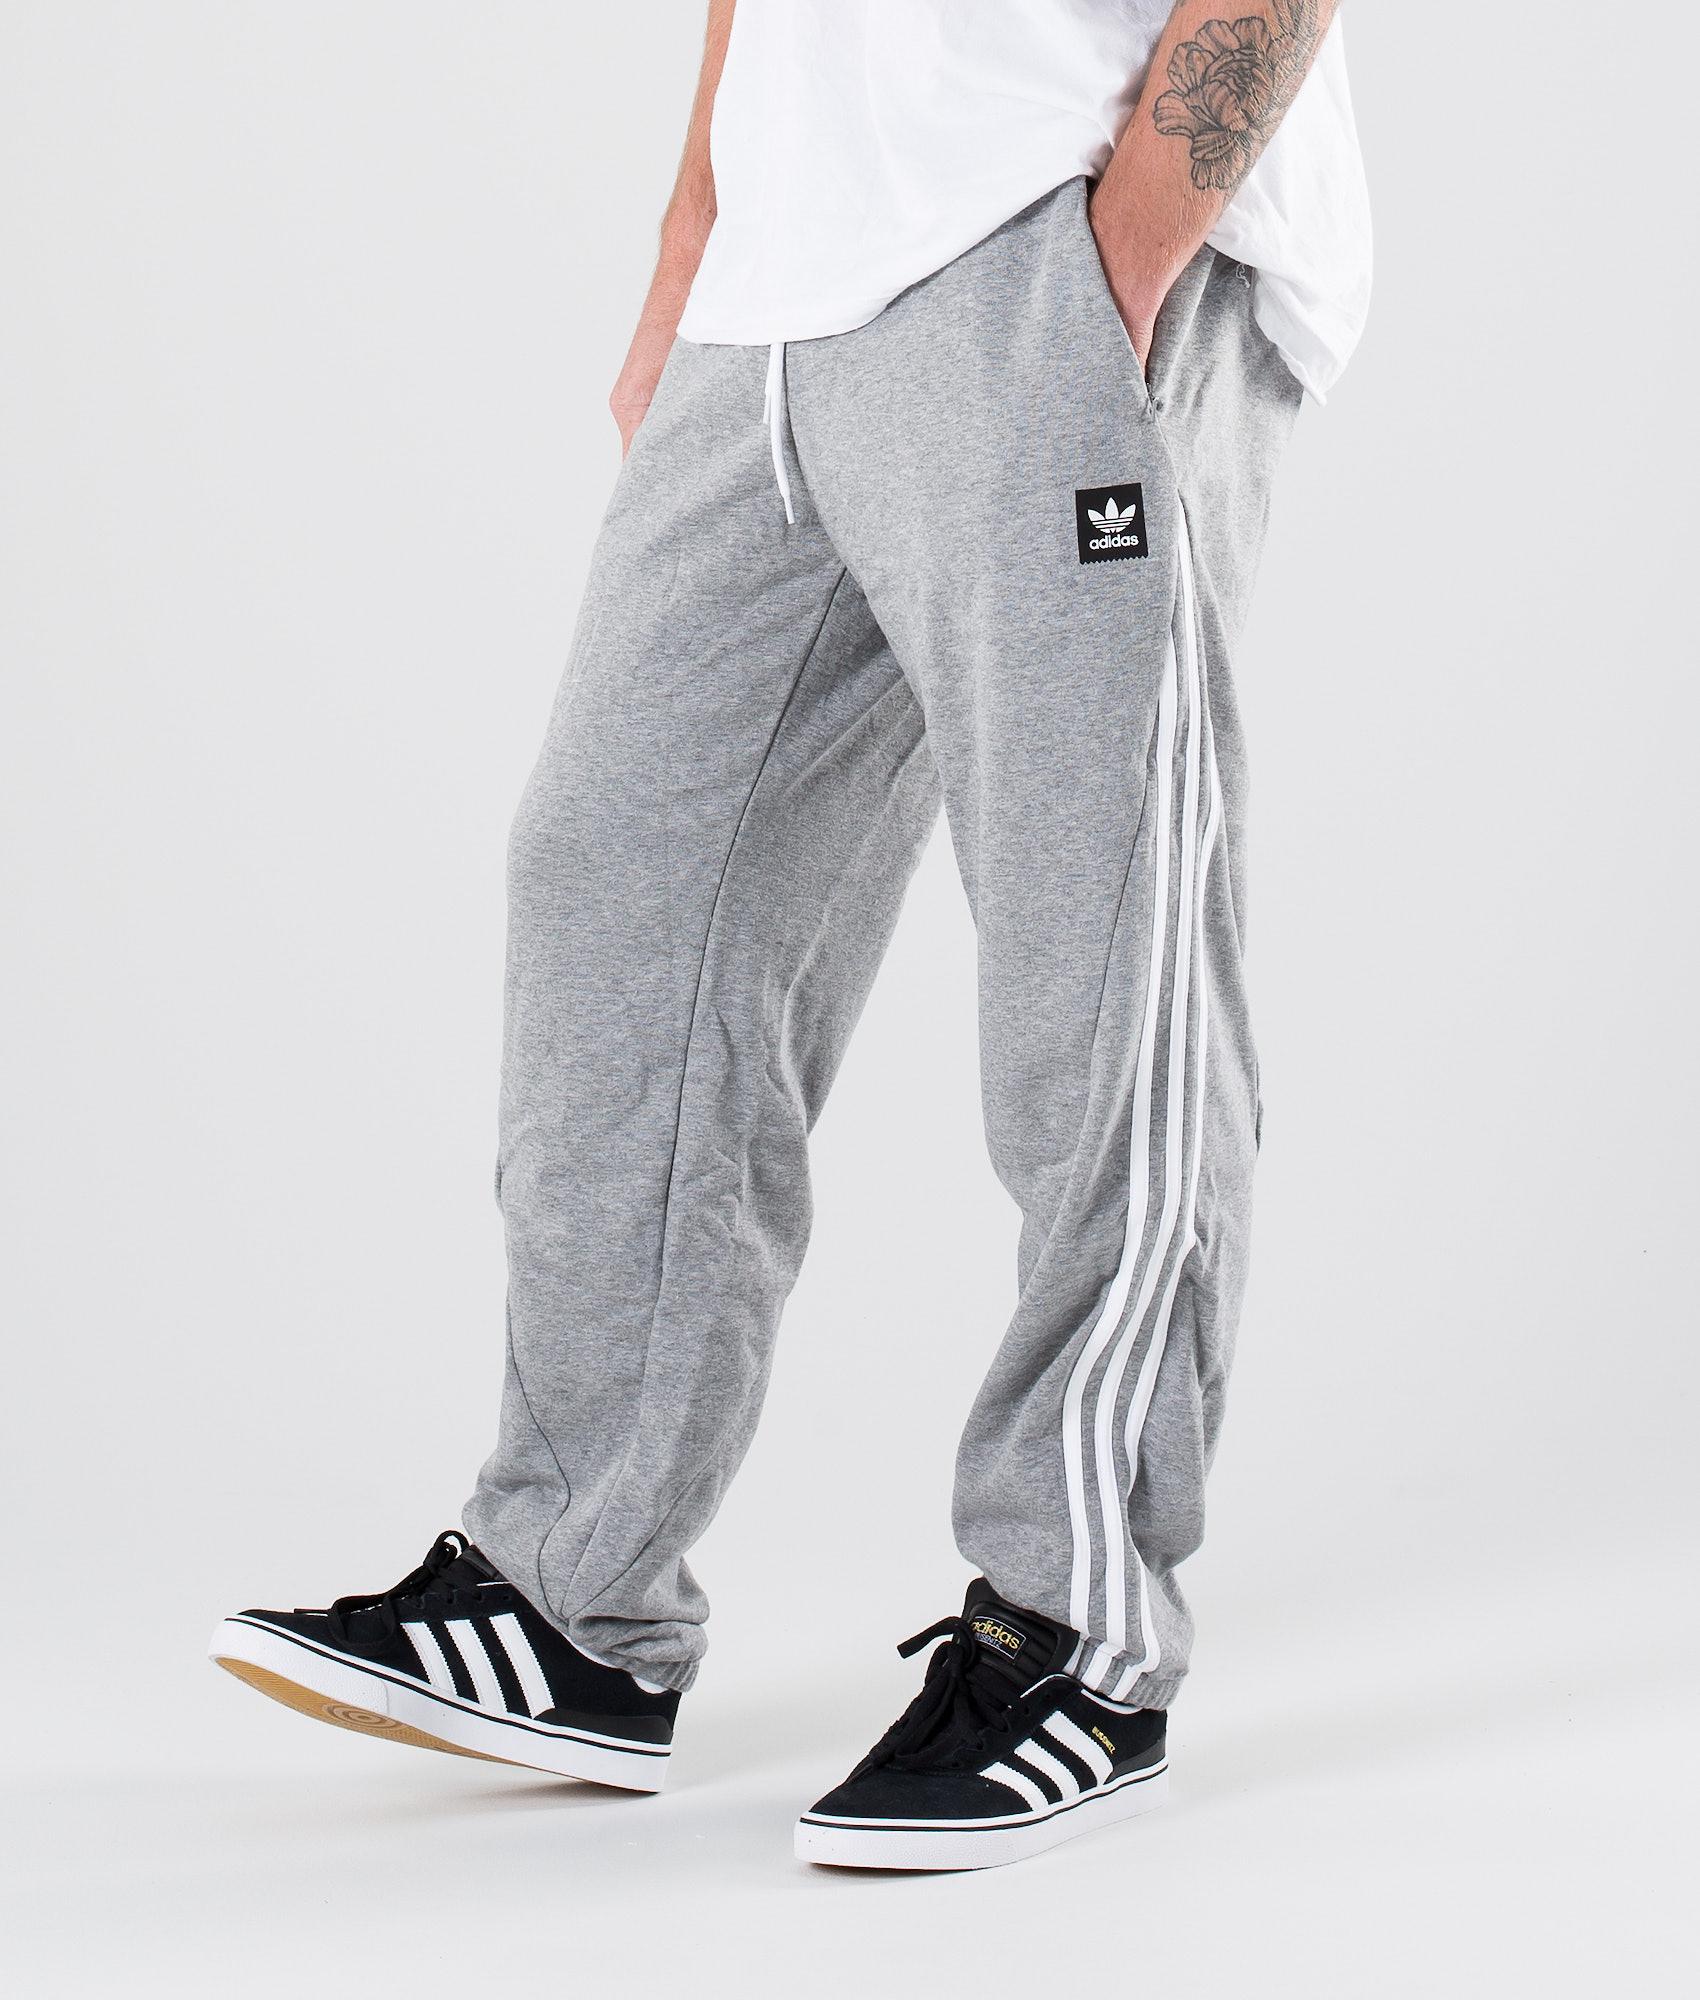 8b859d3ab2c Byxor & Jeans Herr Streetwear | Fri Frakt | Ridestore.se